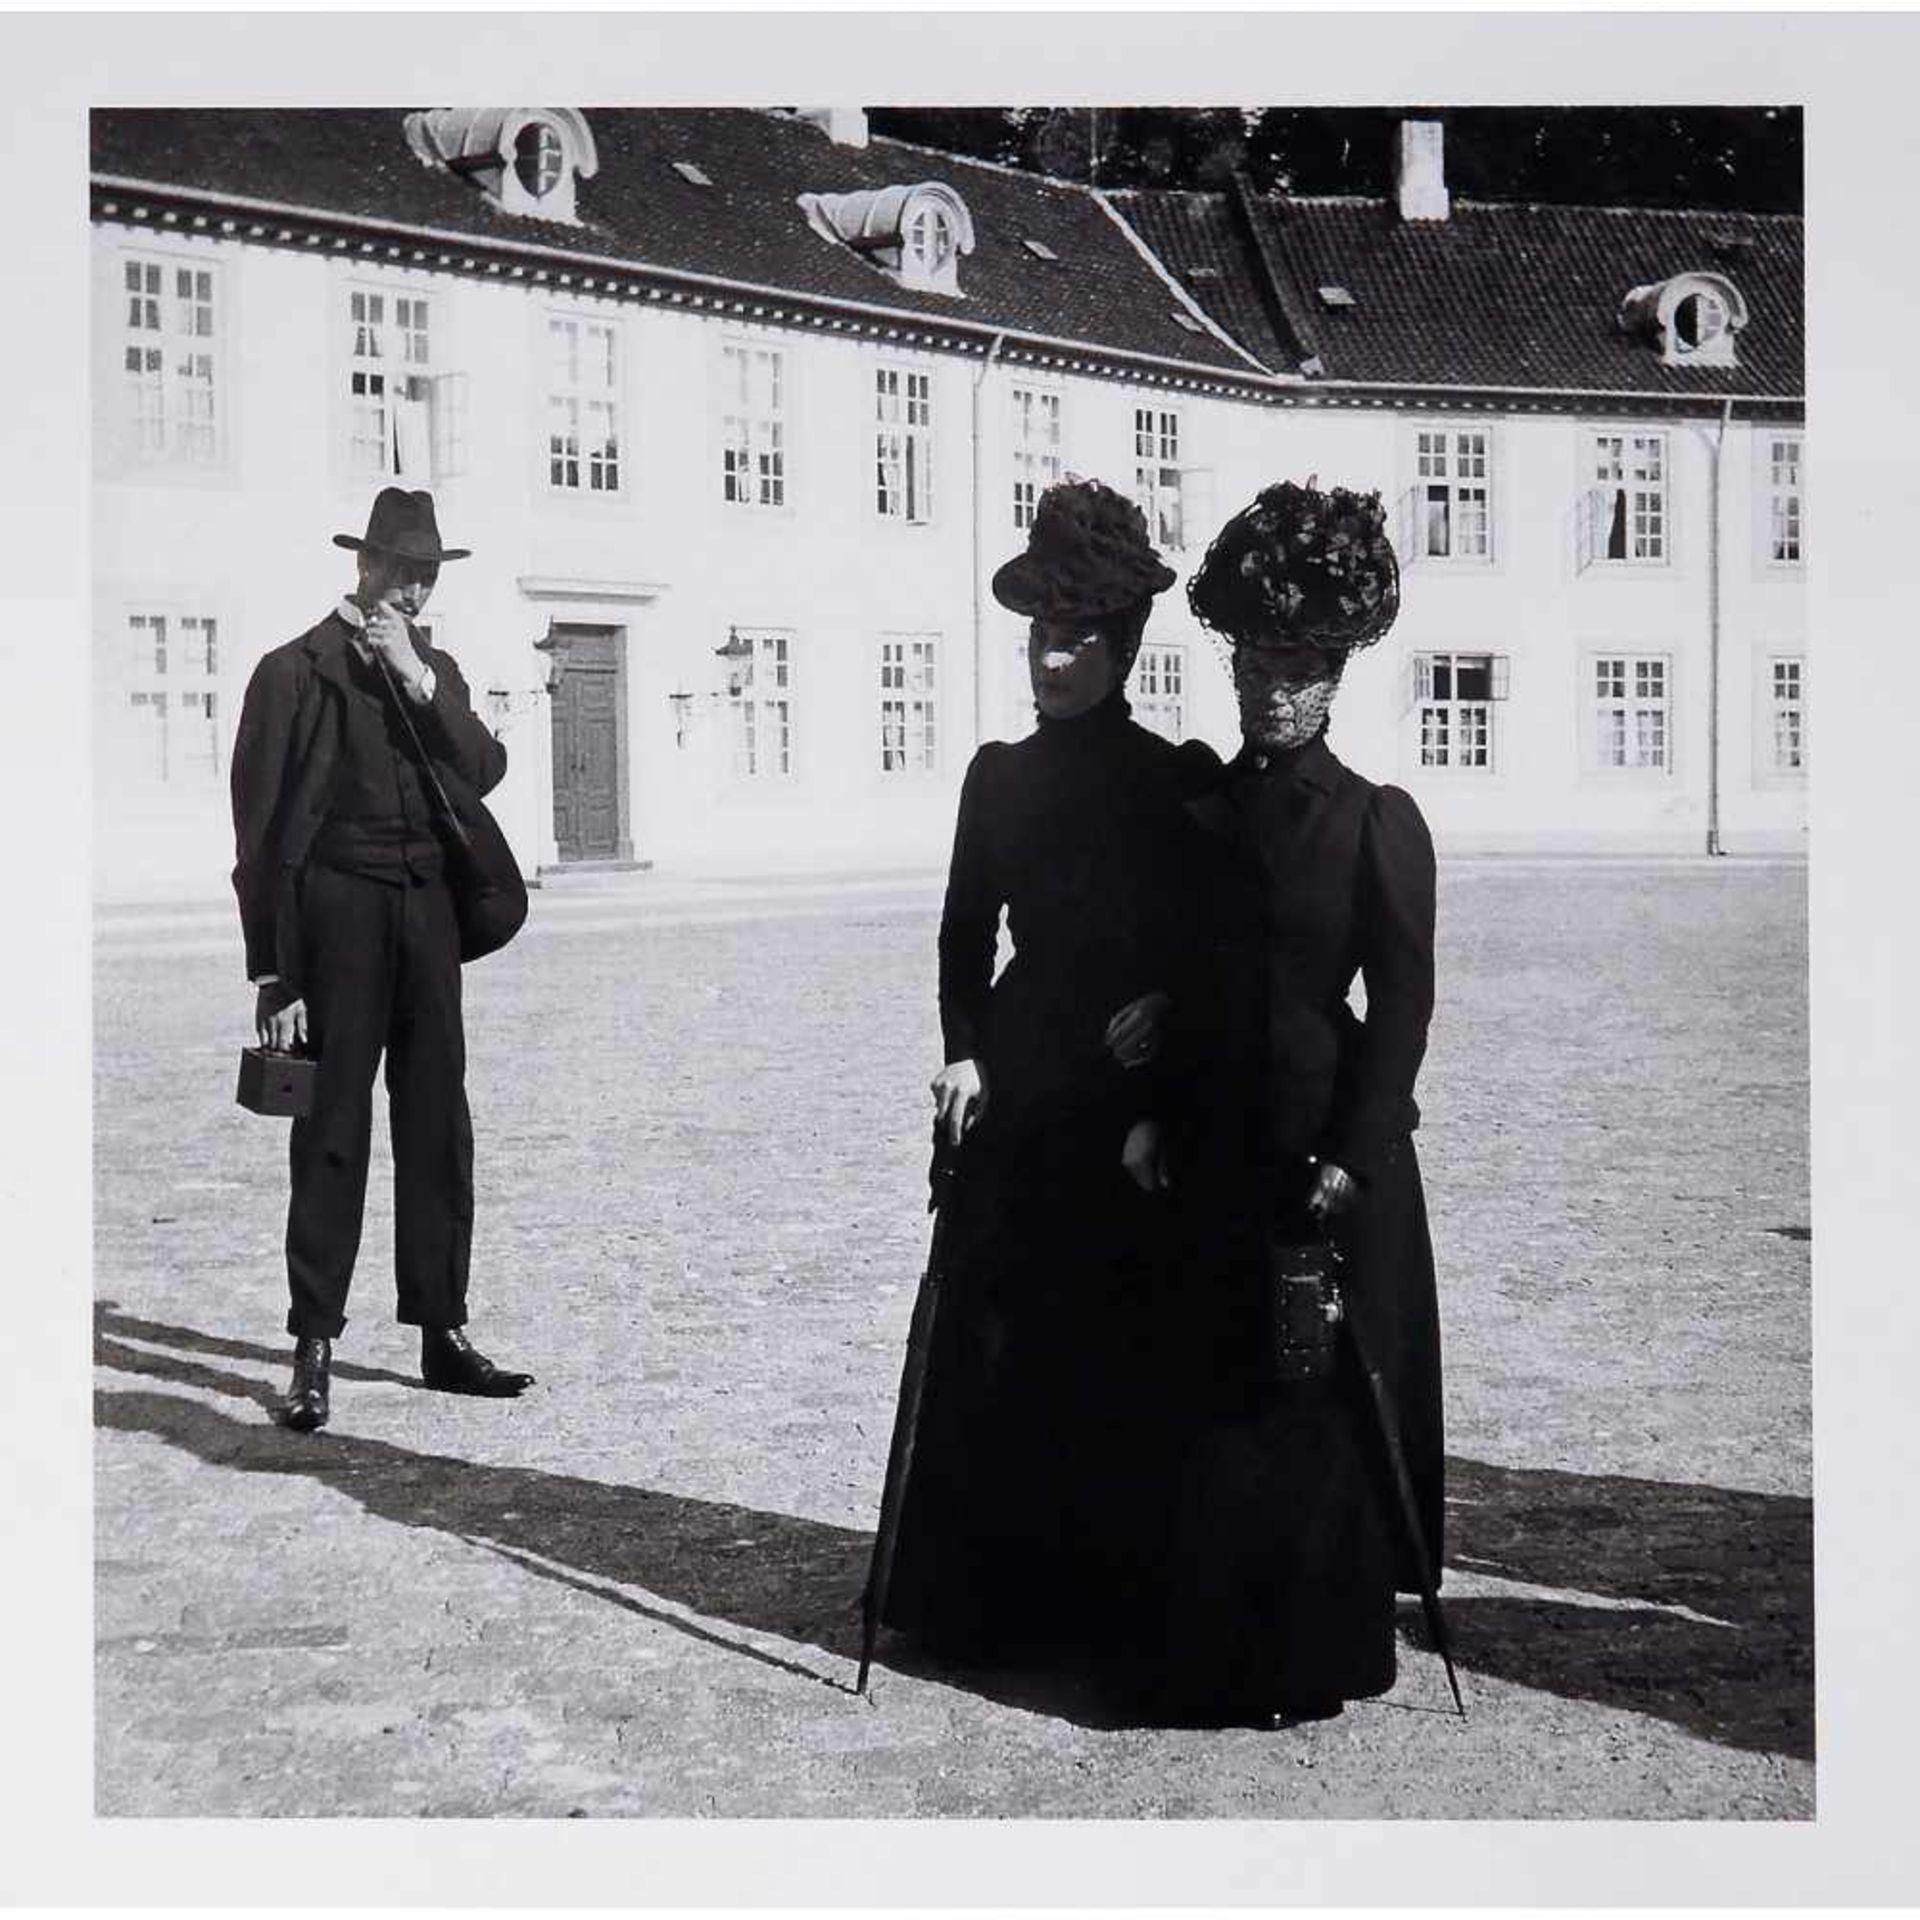 No. 4 Panoram-Kodak (Mod. B) with Danish Royal Provenance, 1900Eastman Kodak, Rochester, USA. Camera - Bild 3 aus 3